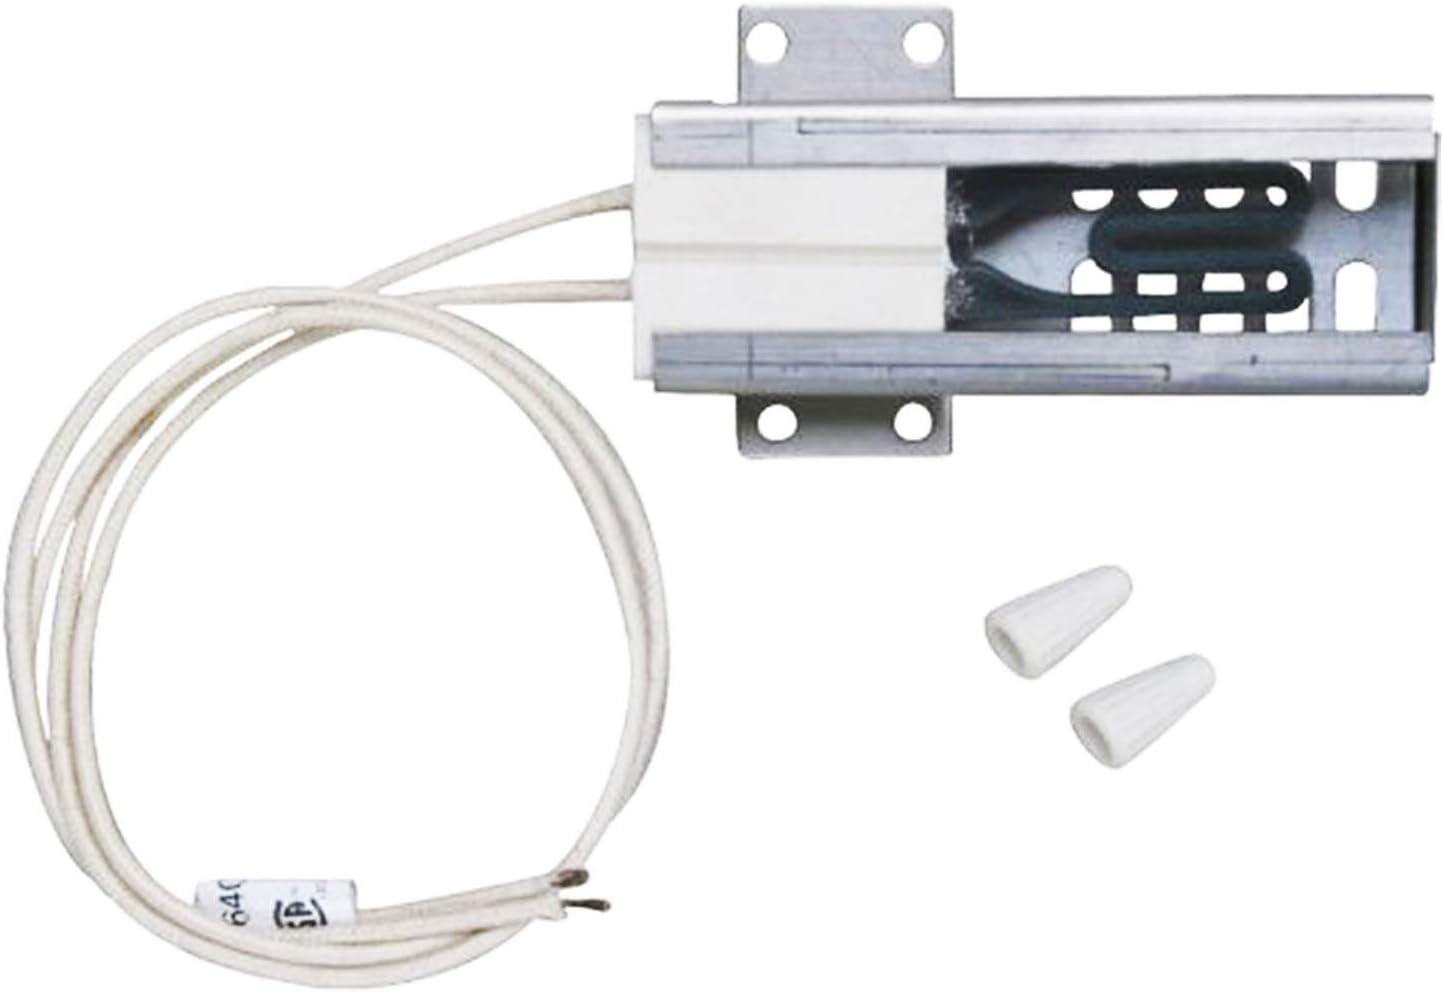 Repairwares Universal Gas Range/Oven Igniter 5303935066 WB13K21 WB2X9998 Norton-501a WCI-5303935066 AP2150412 WB13K0021 PS470129 WB13T10001 41-205